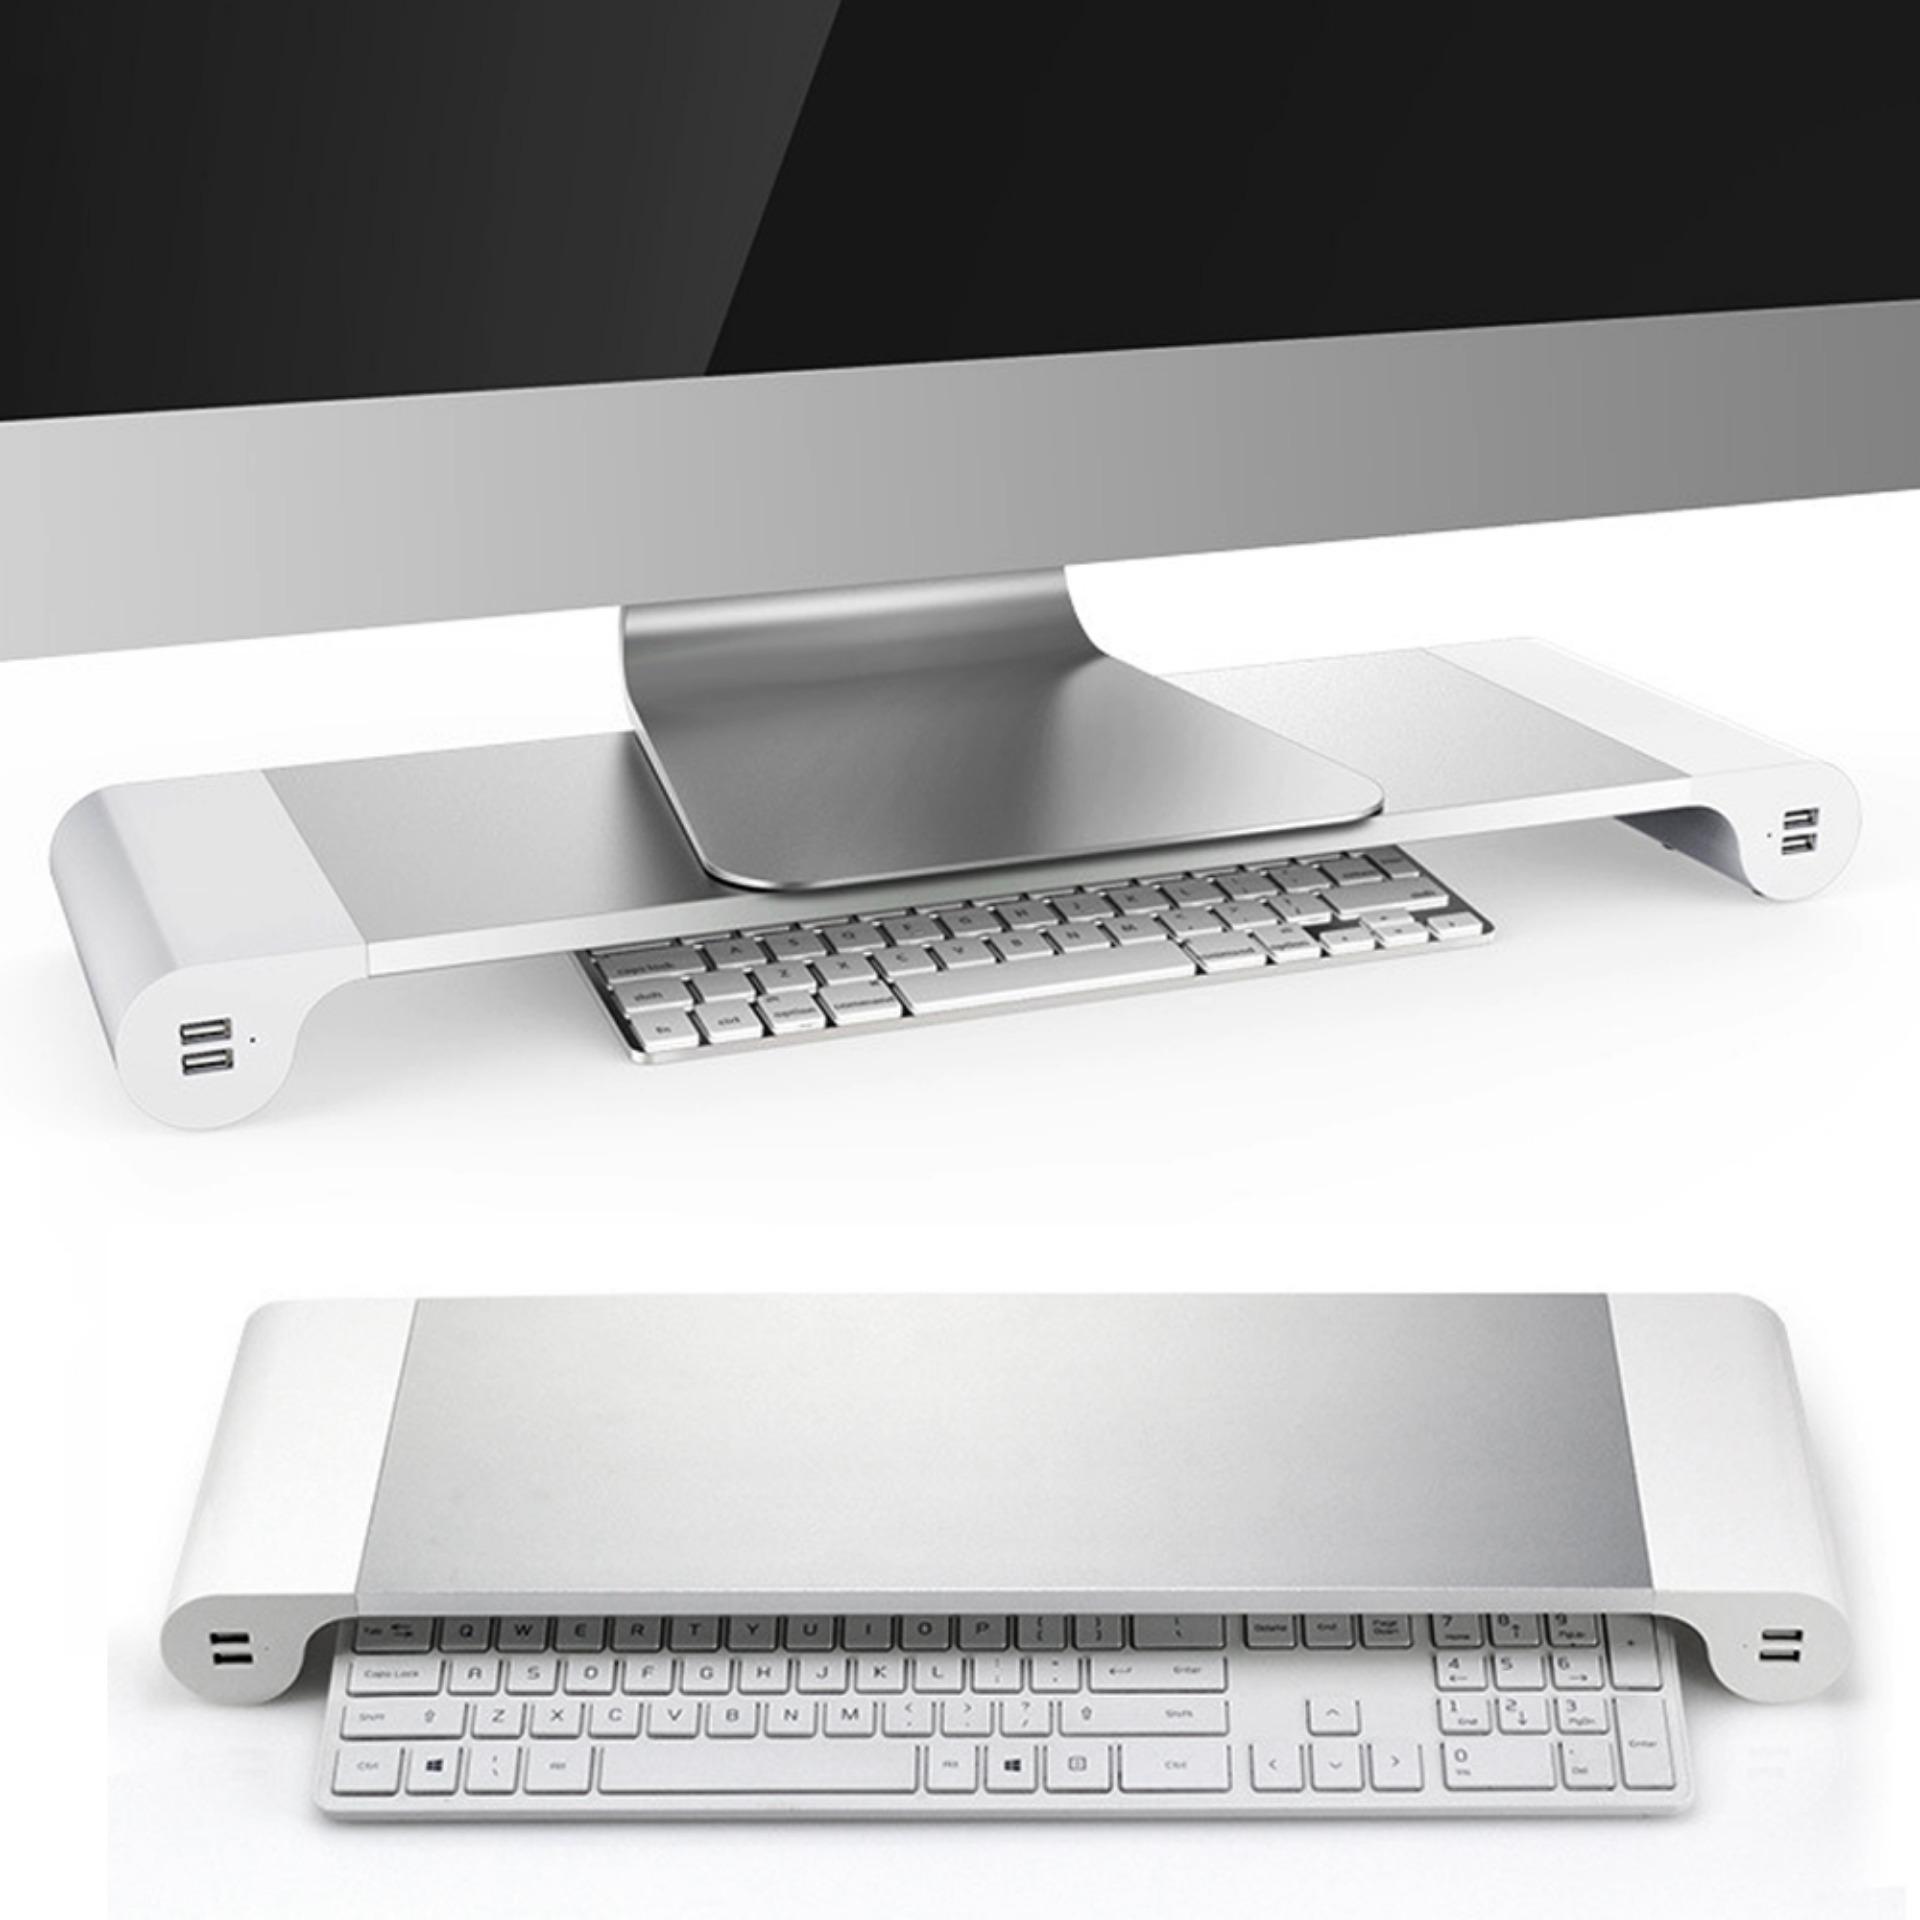 Vococal Aluminum Alloy Monitor Stand Space Bar Non Slip Computer Laptop Dock Desk